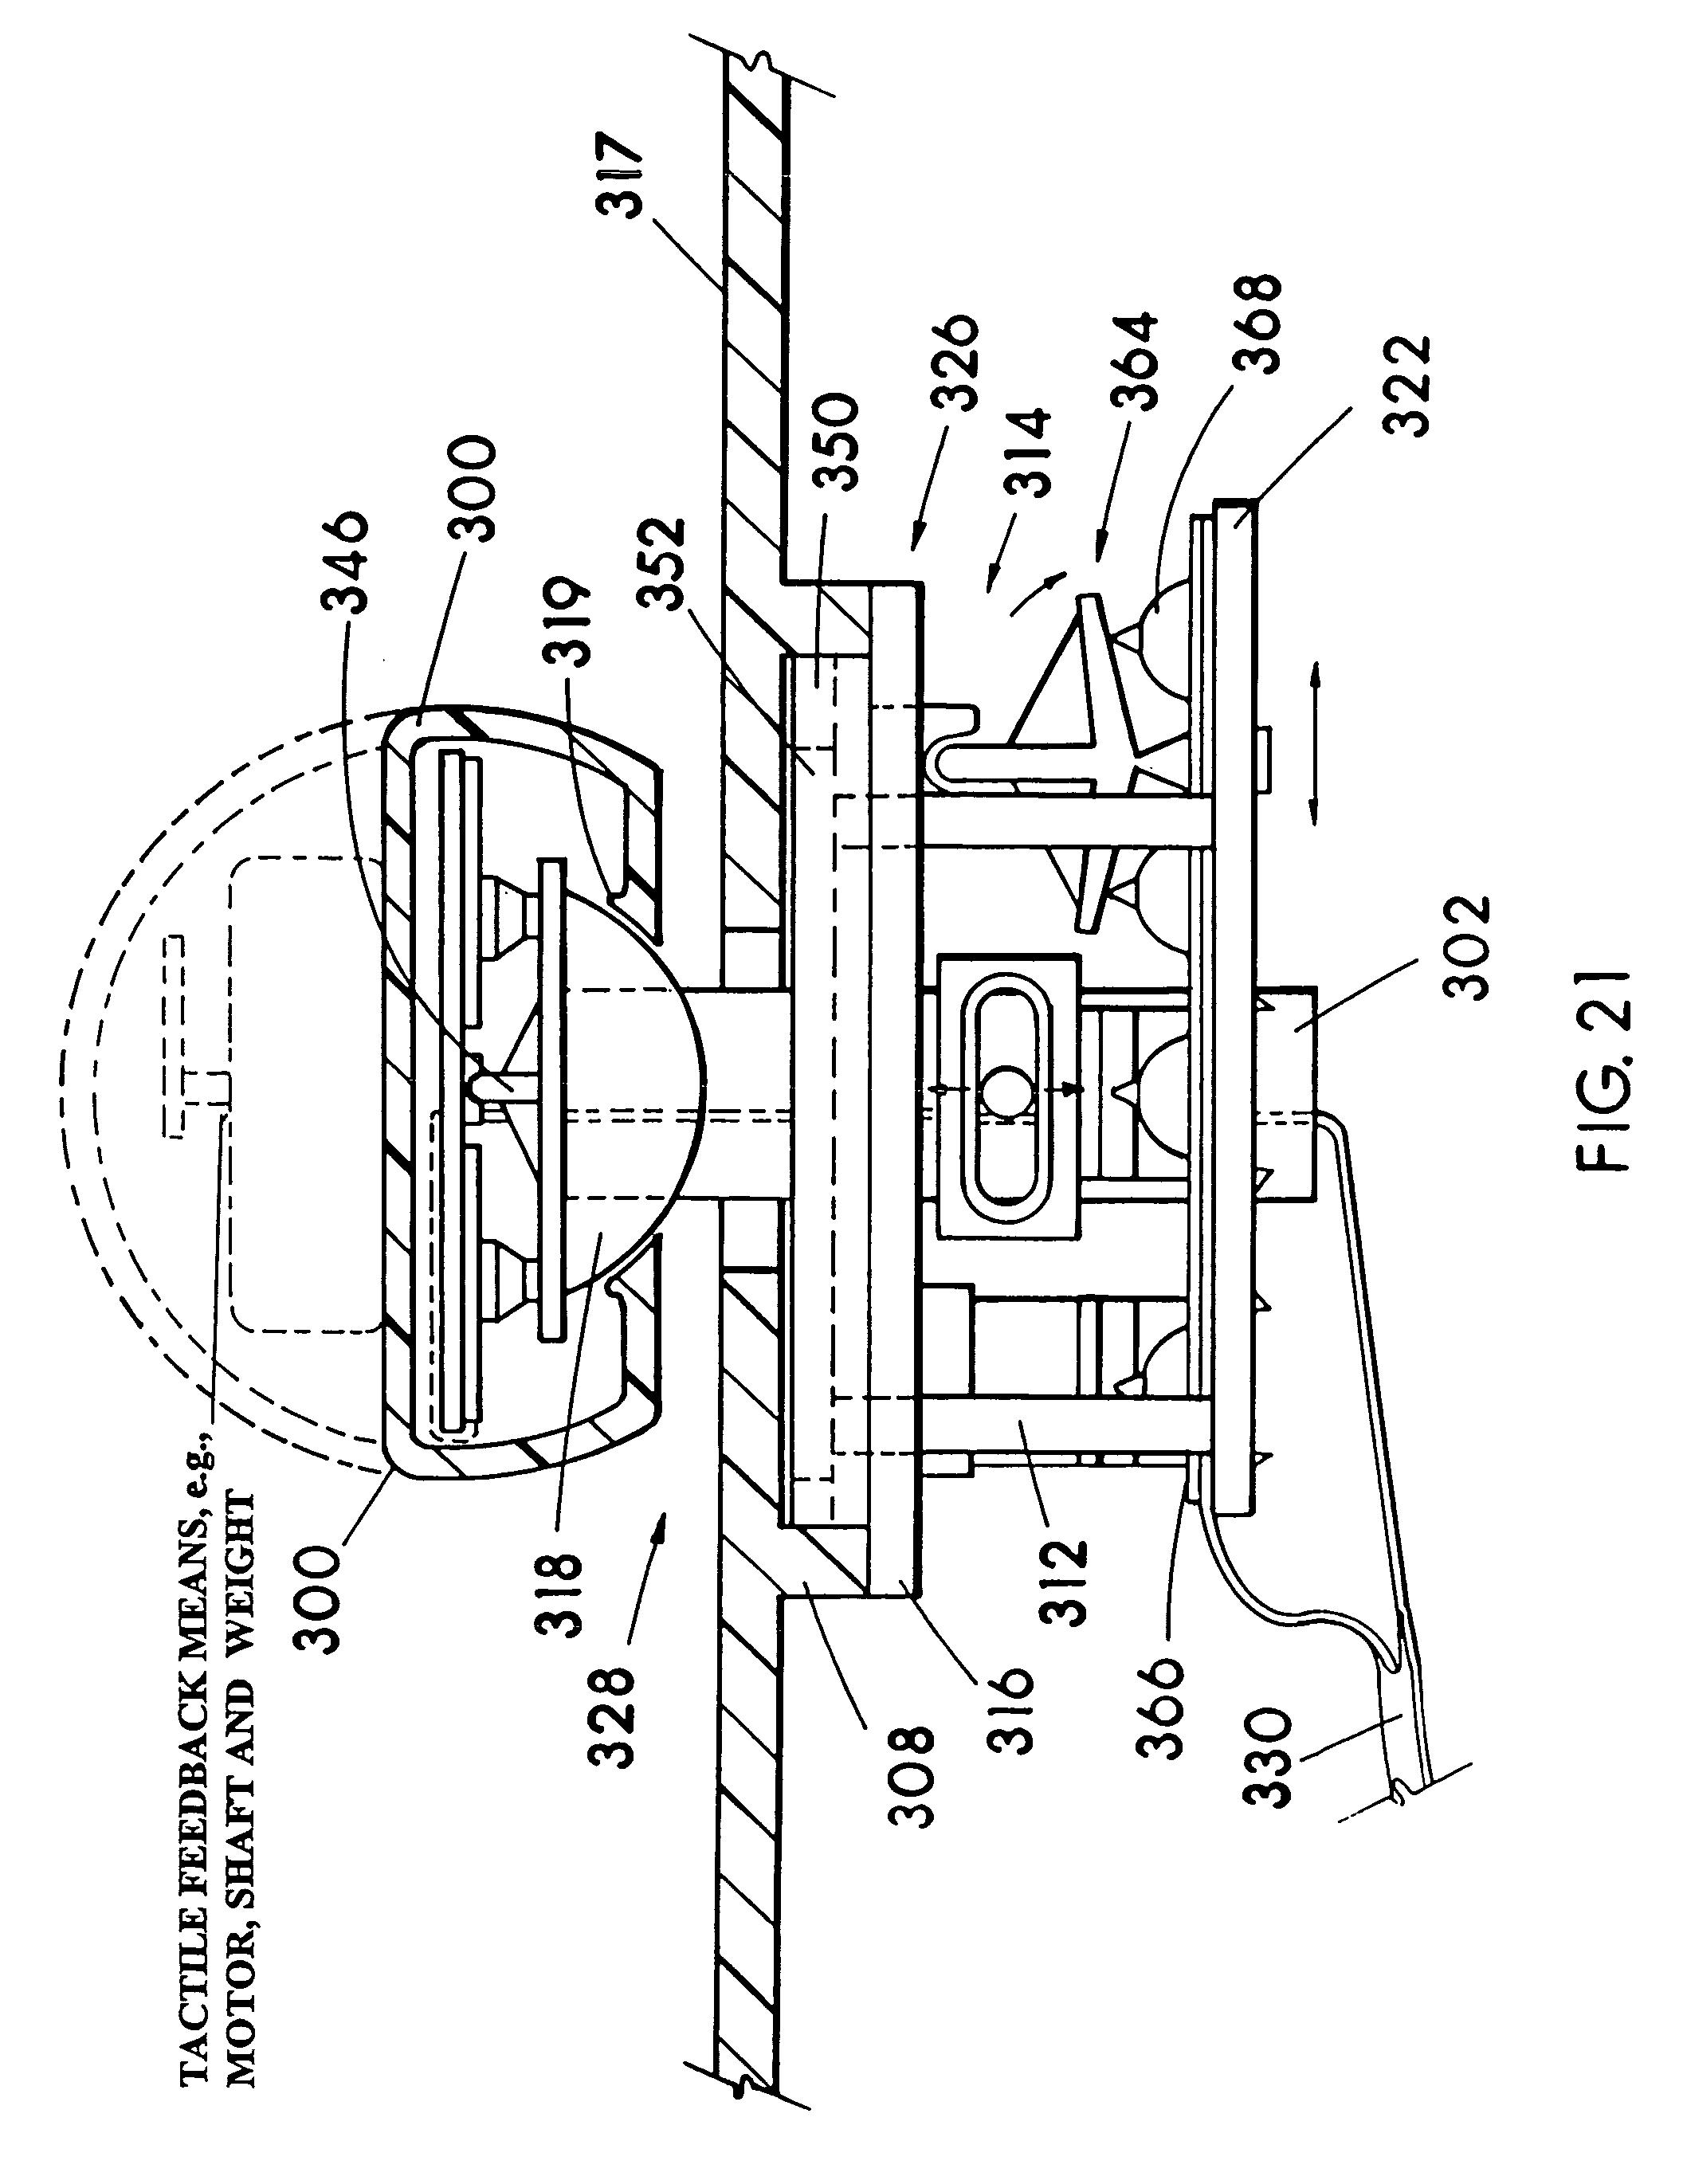 Kwikplug Wiring Diagram